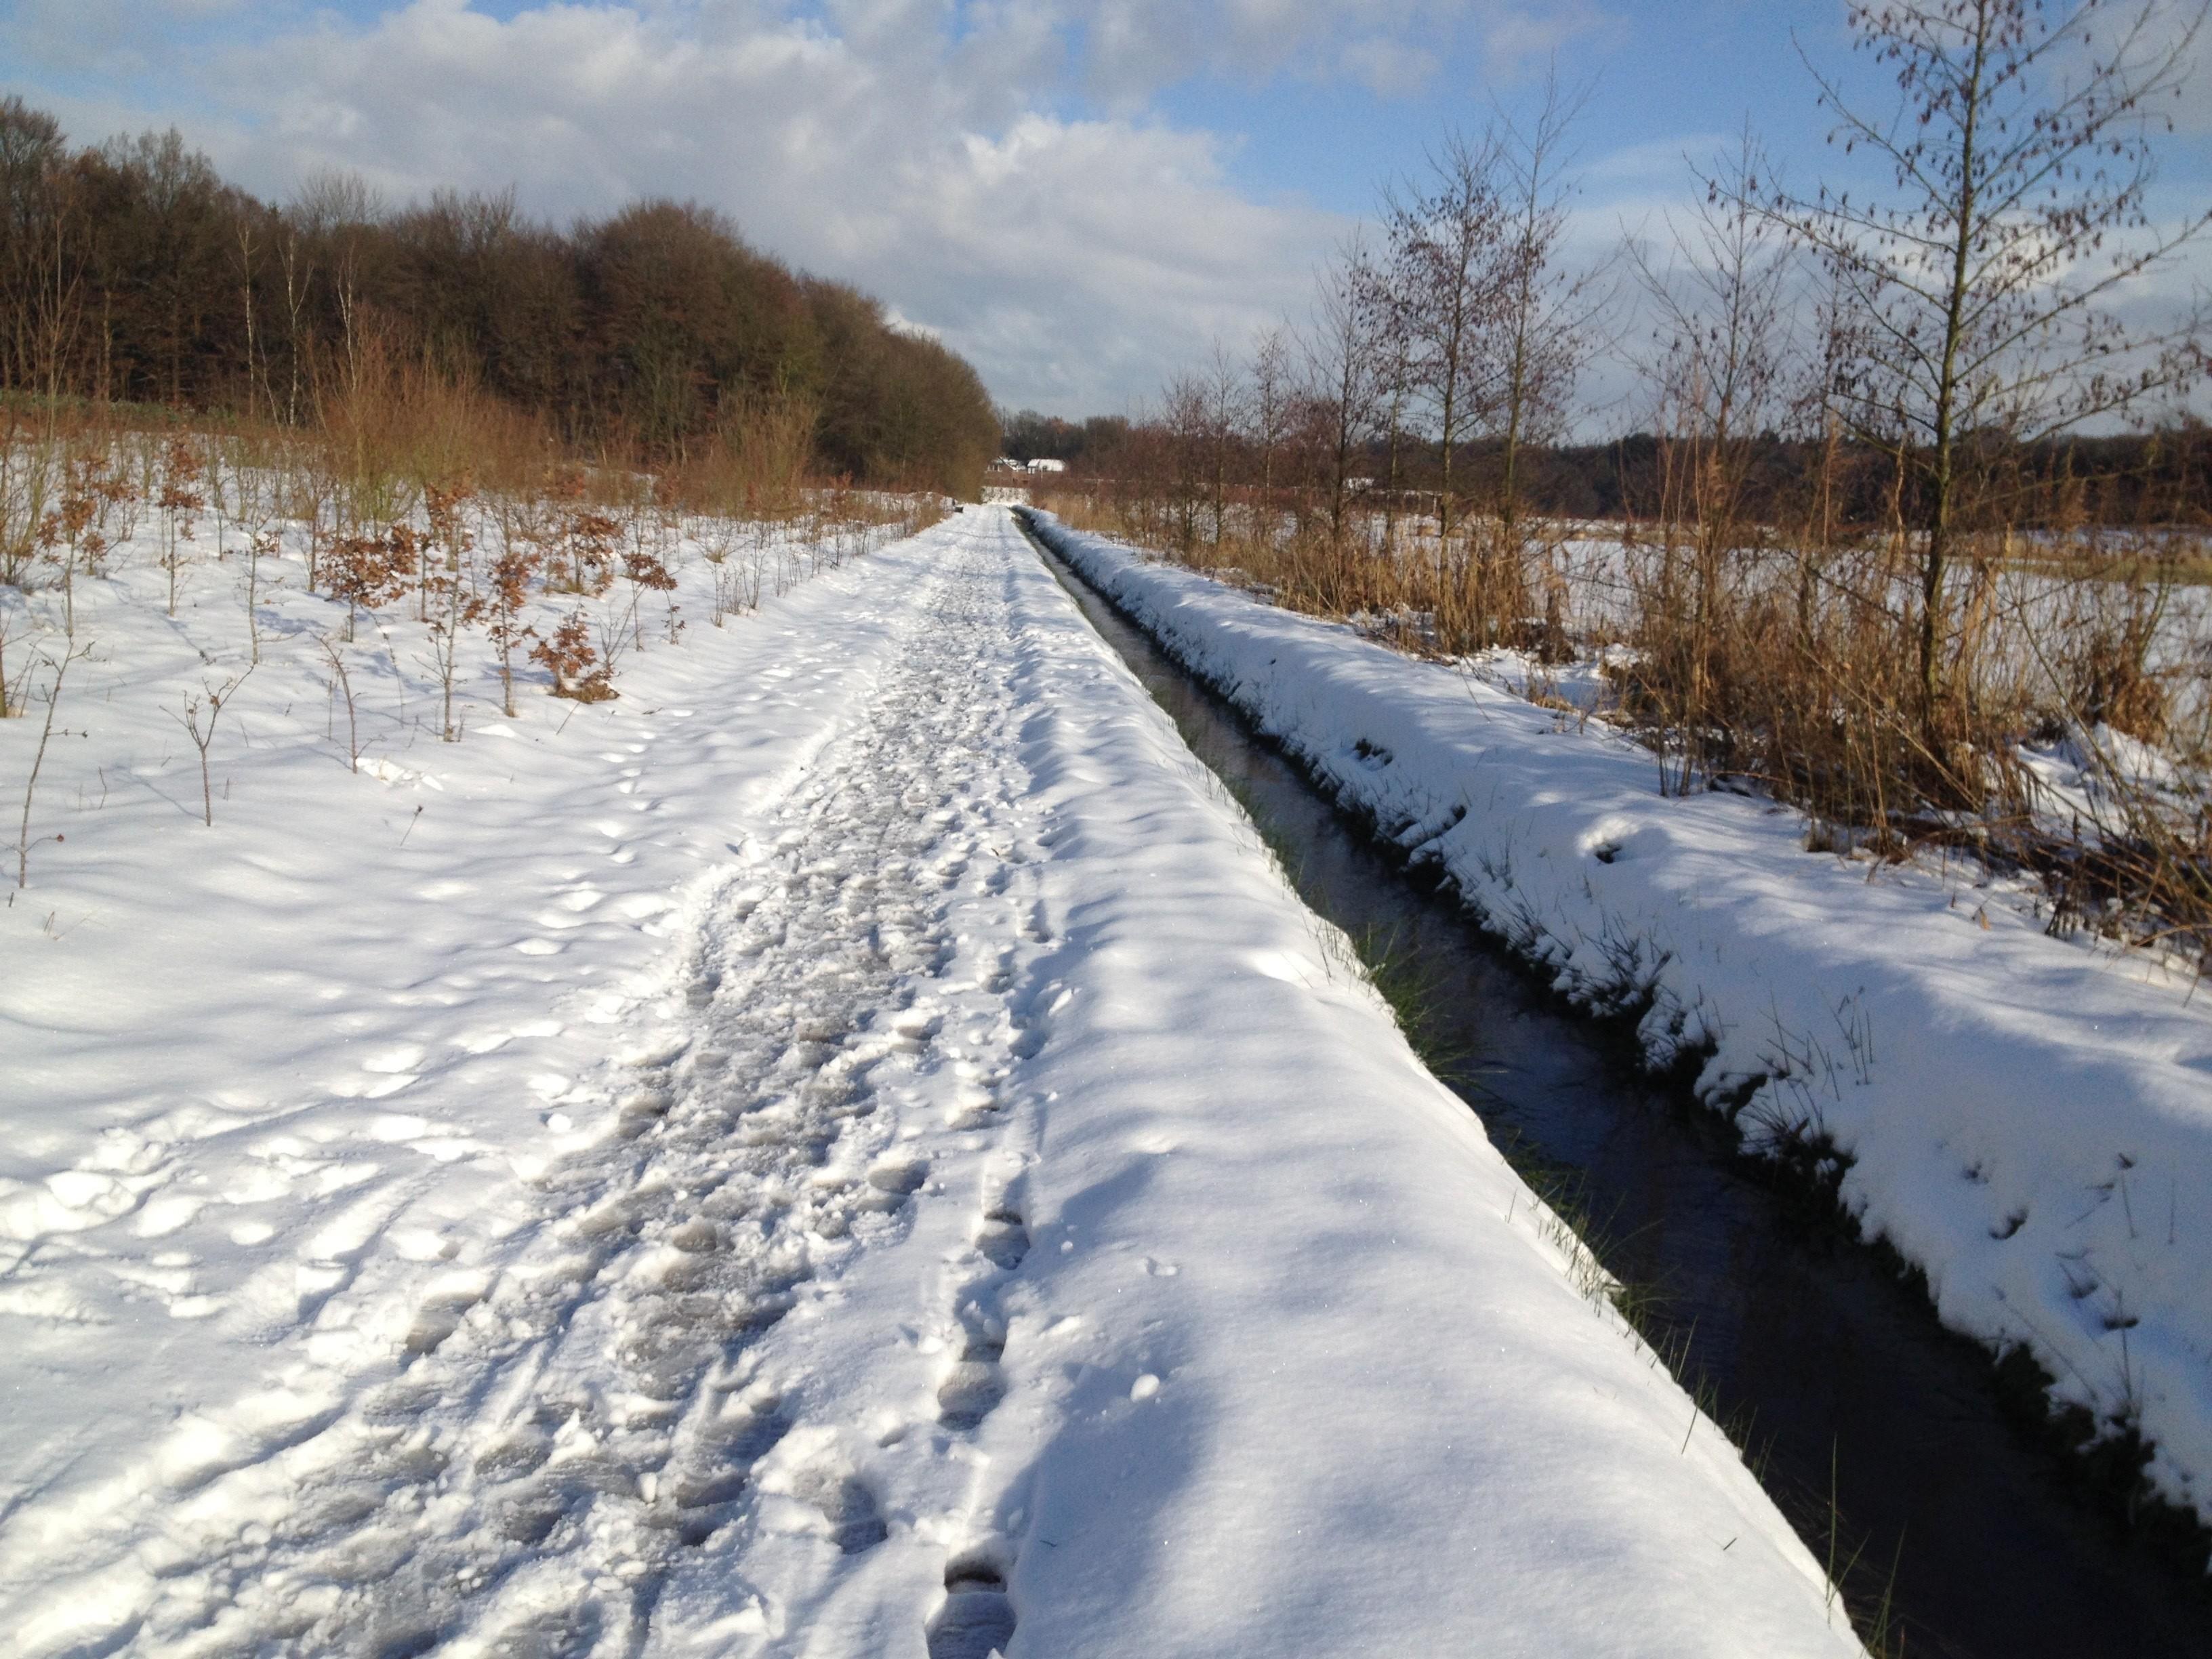 Winter wandeling - lifefullness Coaching